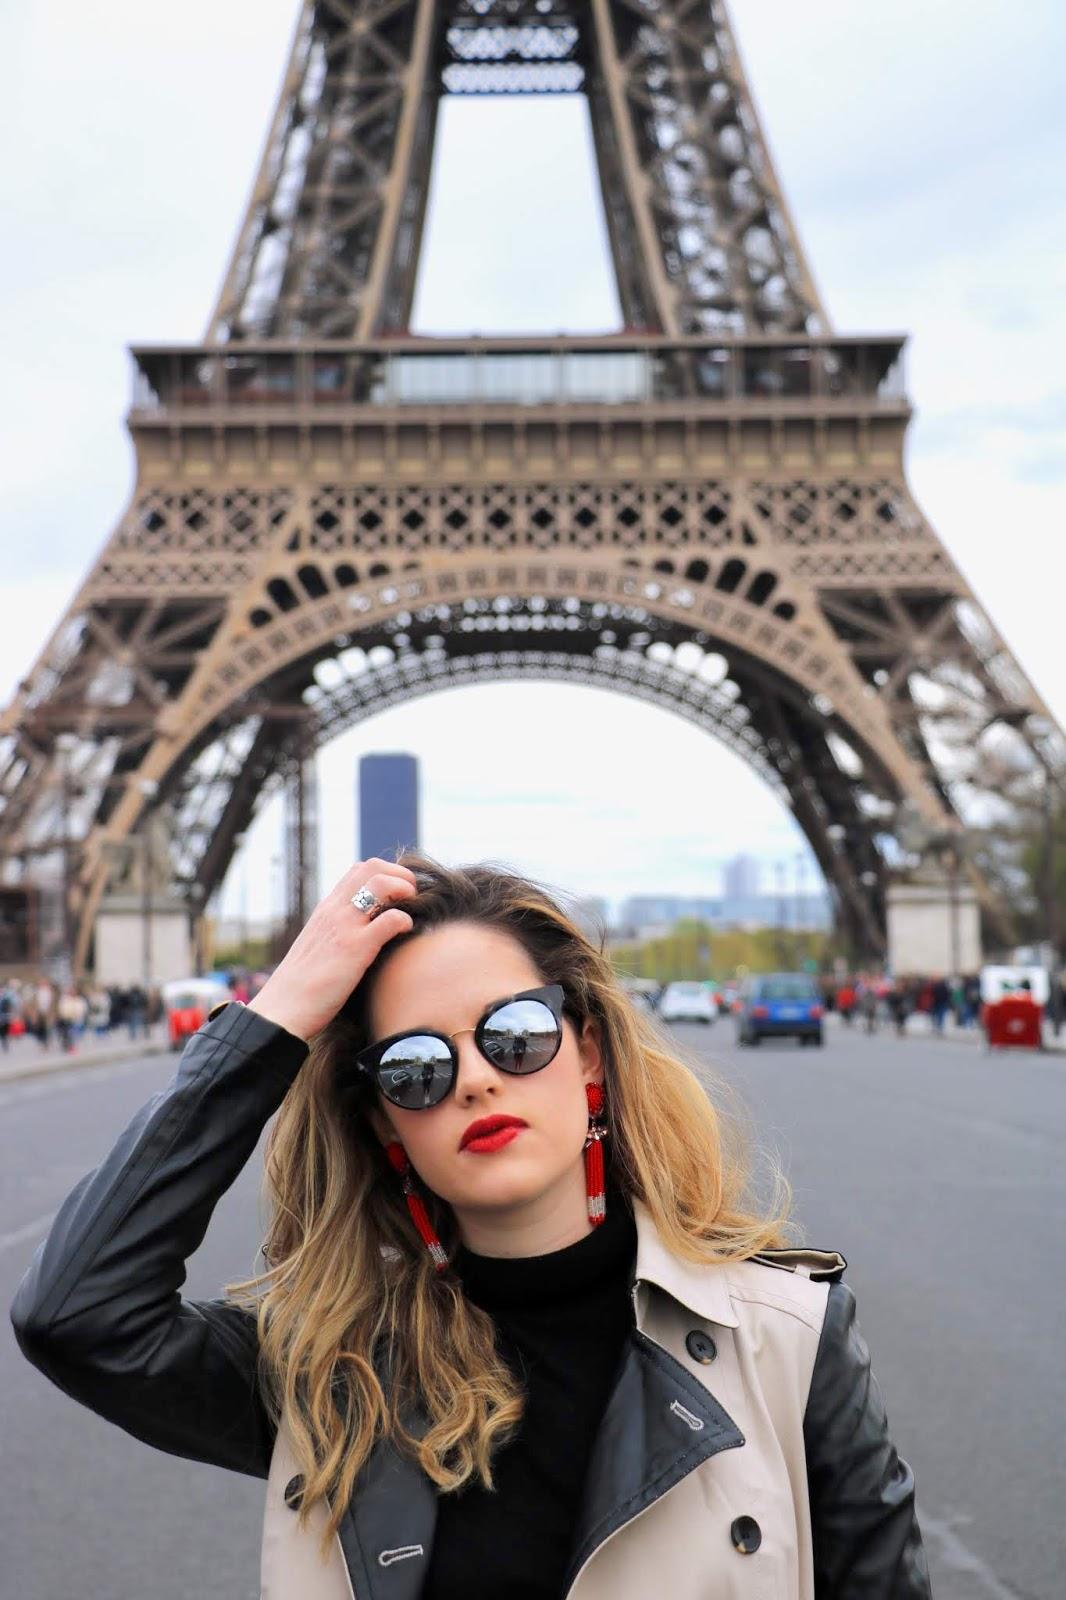 Eiffel Tower photo shoot locations